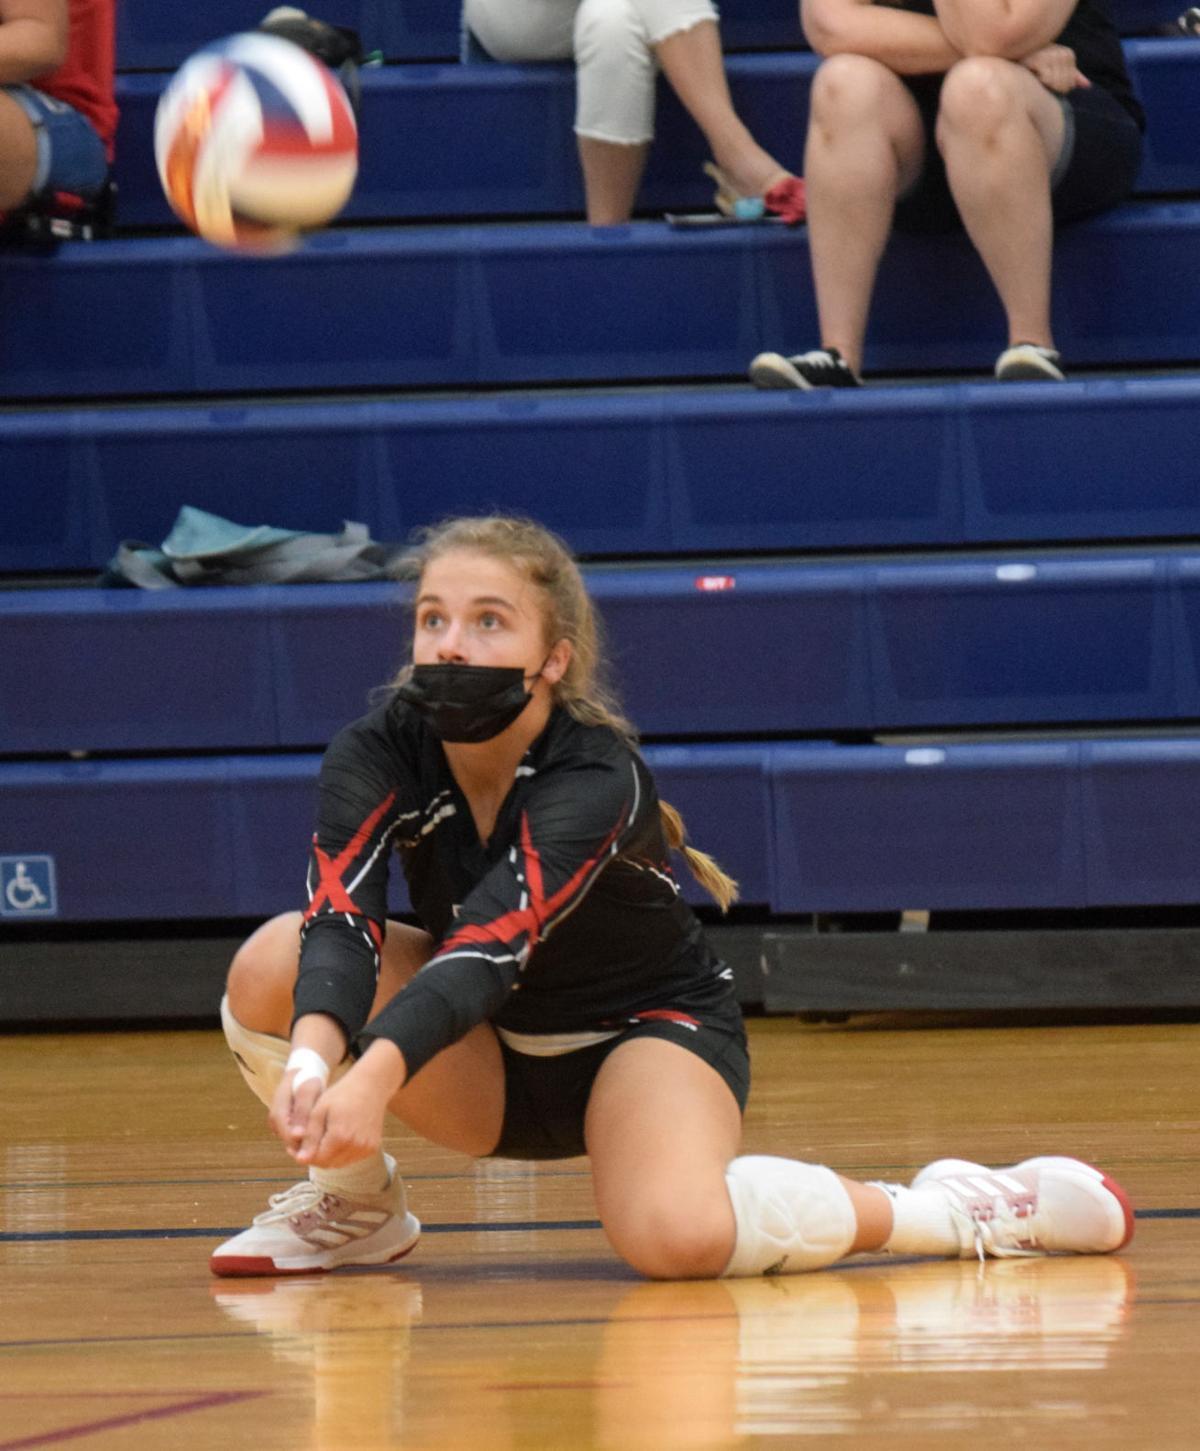 prep volleyball photo 9-28